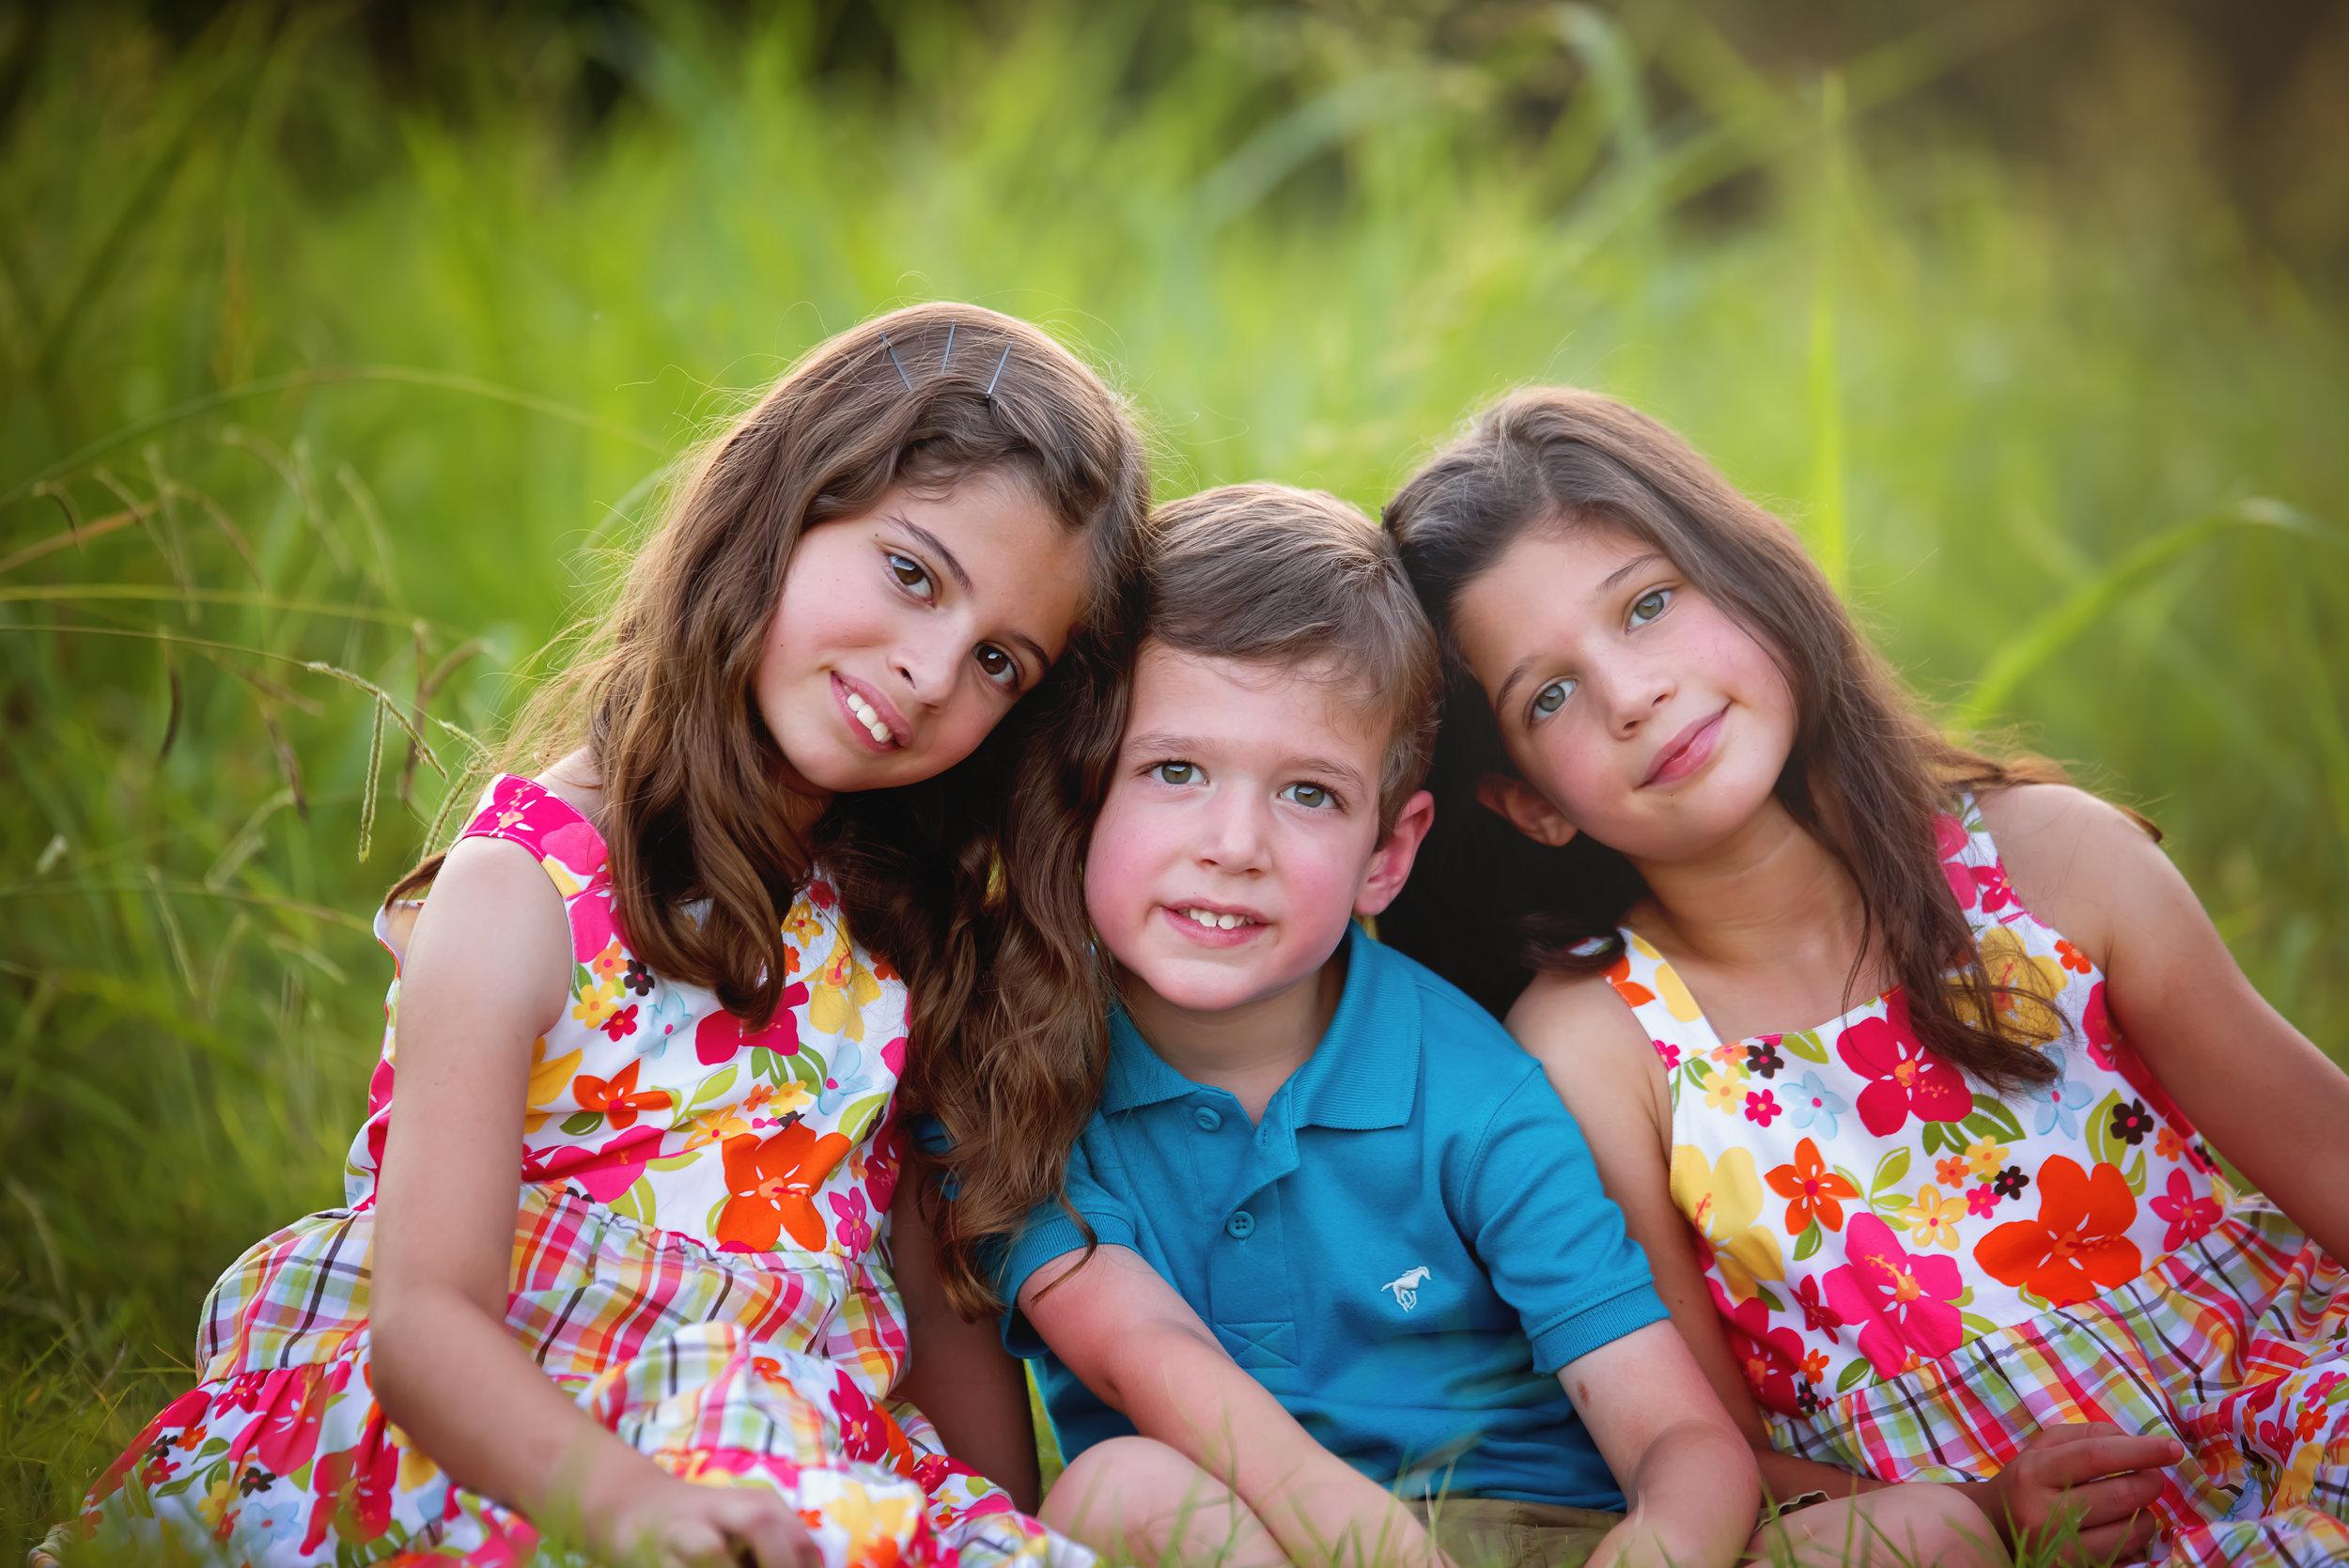 Reina-LeGrand-Photography-Photographer-Family-DFW-Dallas-Fort-Worth-Denton-Southlake-Colleyville-Grapevine-Roanoke-Keller-Westlake-Portrait-Portraiture-Photo-Session-Bina5.jpg